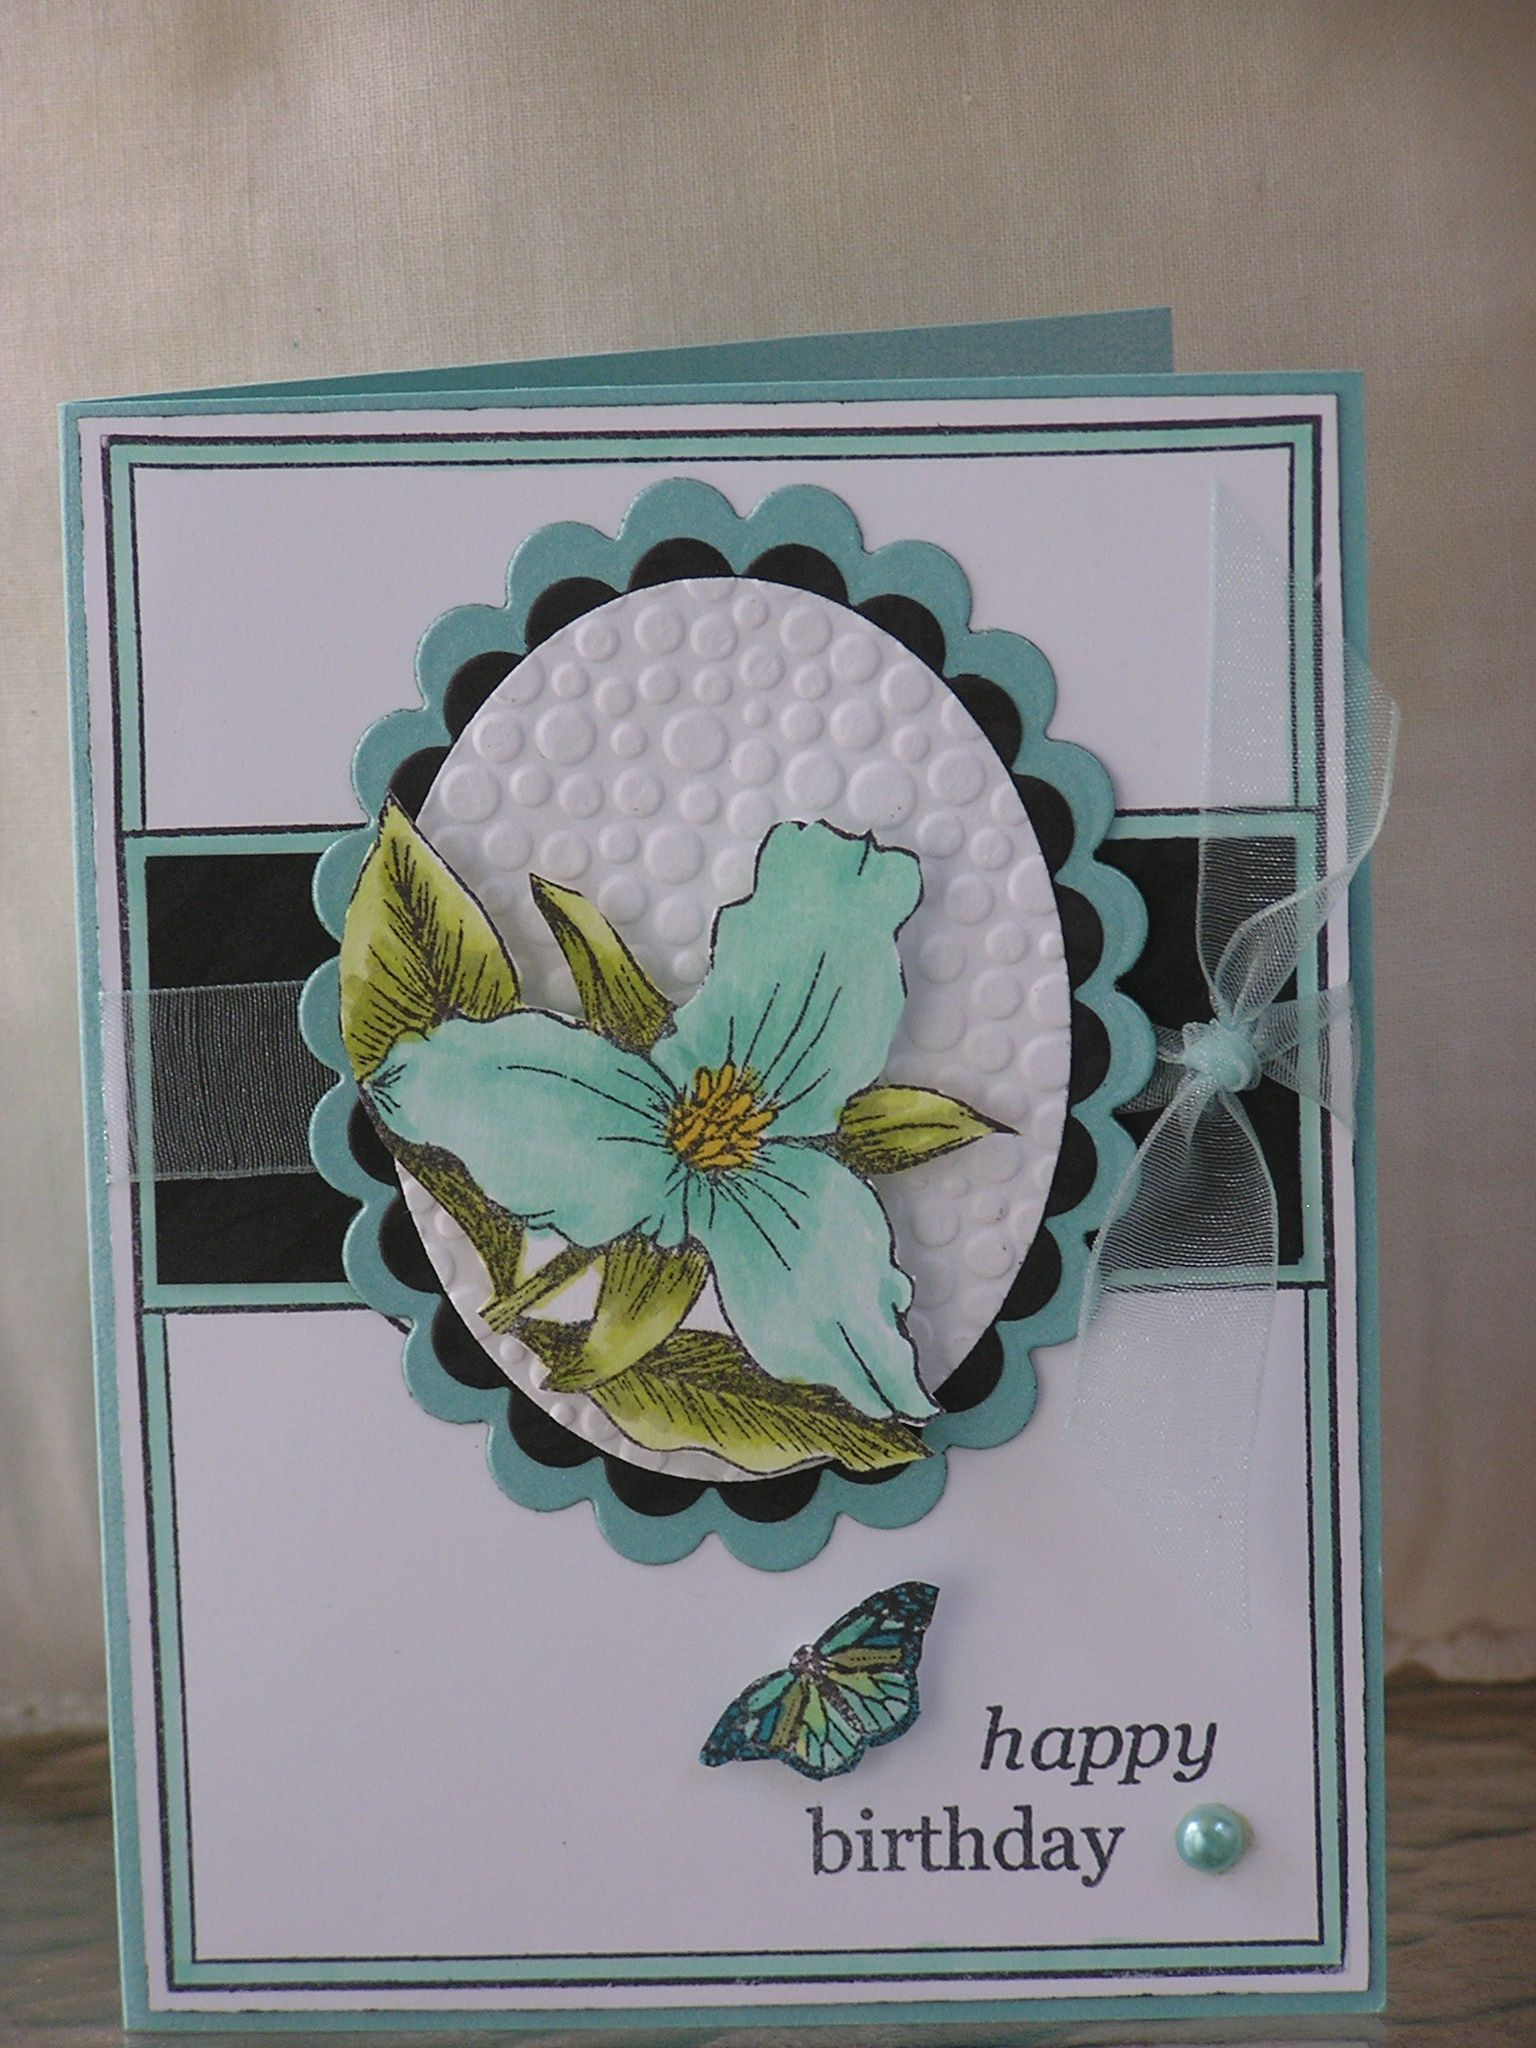 Dimensional Layered Card